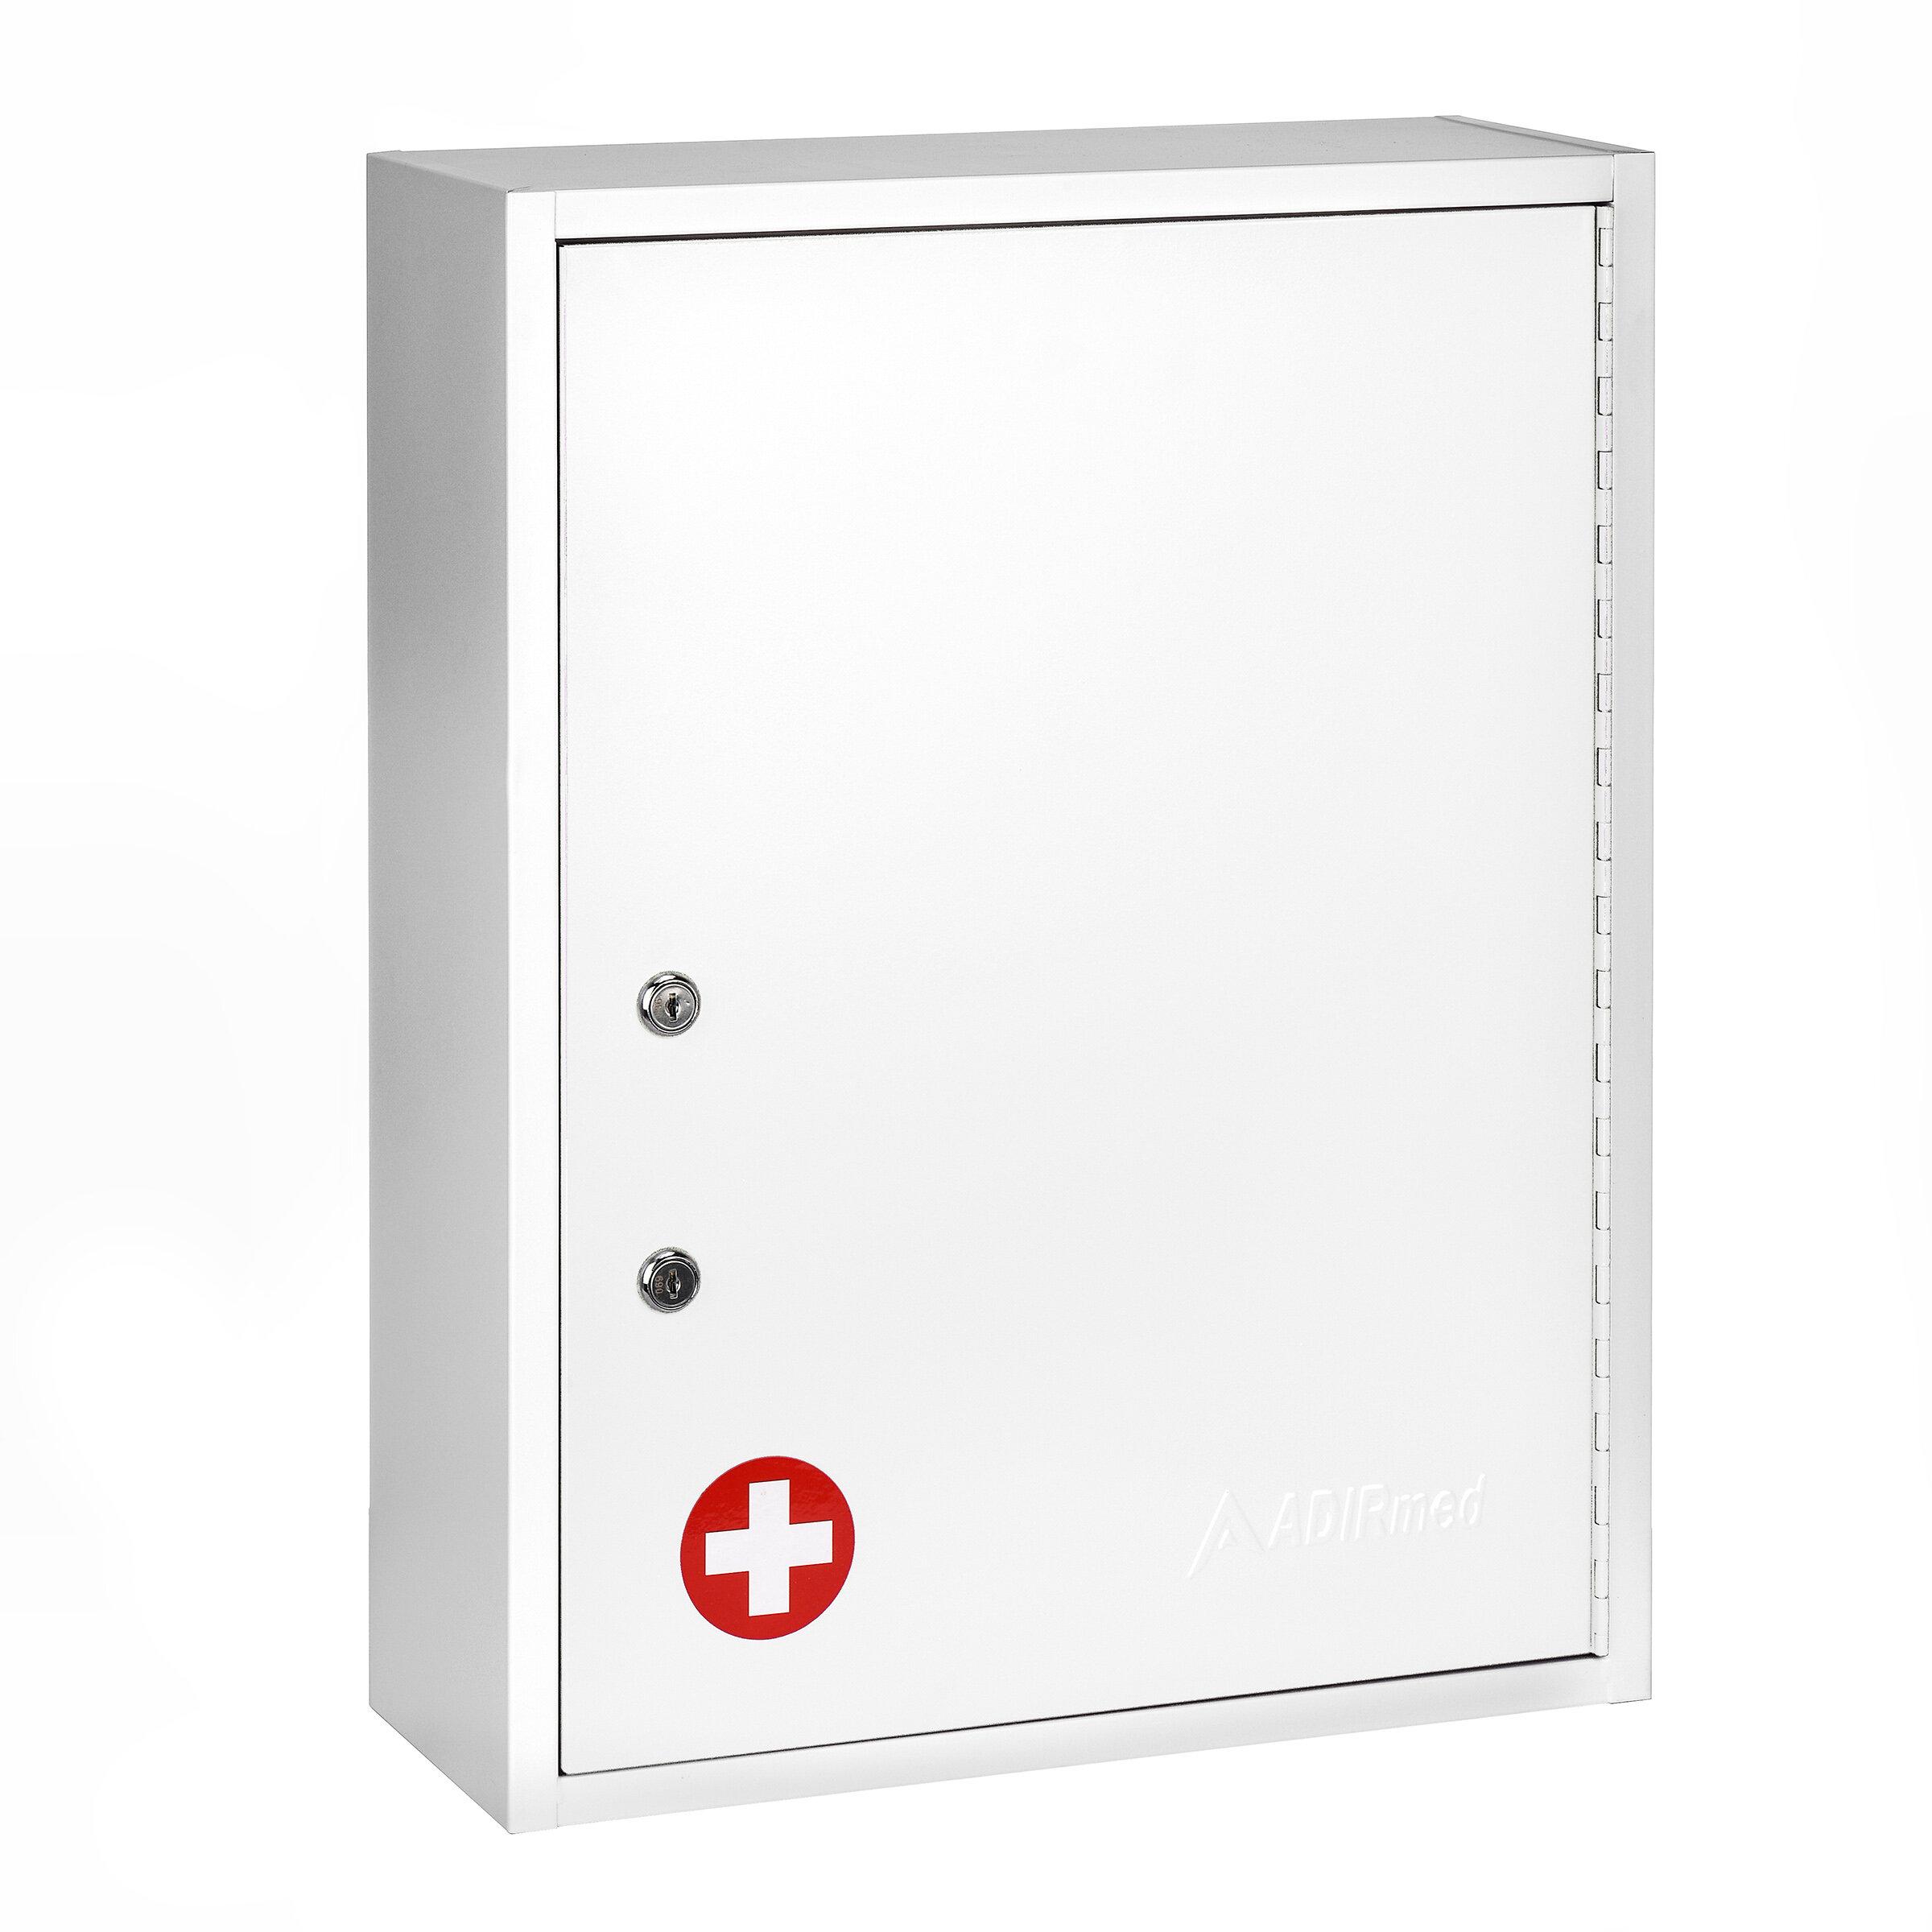 Adirmed Medical Security Dual Lock 16 W X 21 H Wall Mounted Cabinet Reviews Wayfair